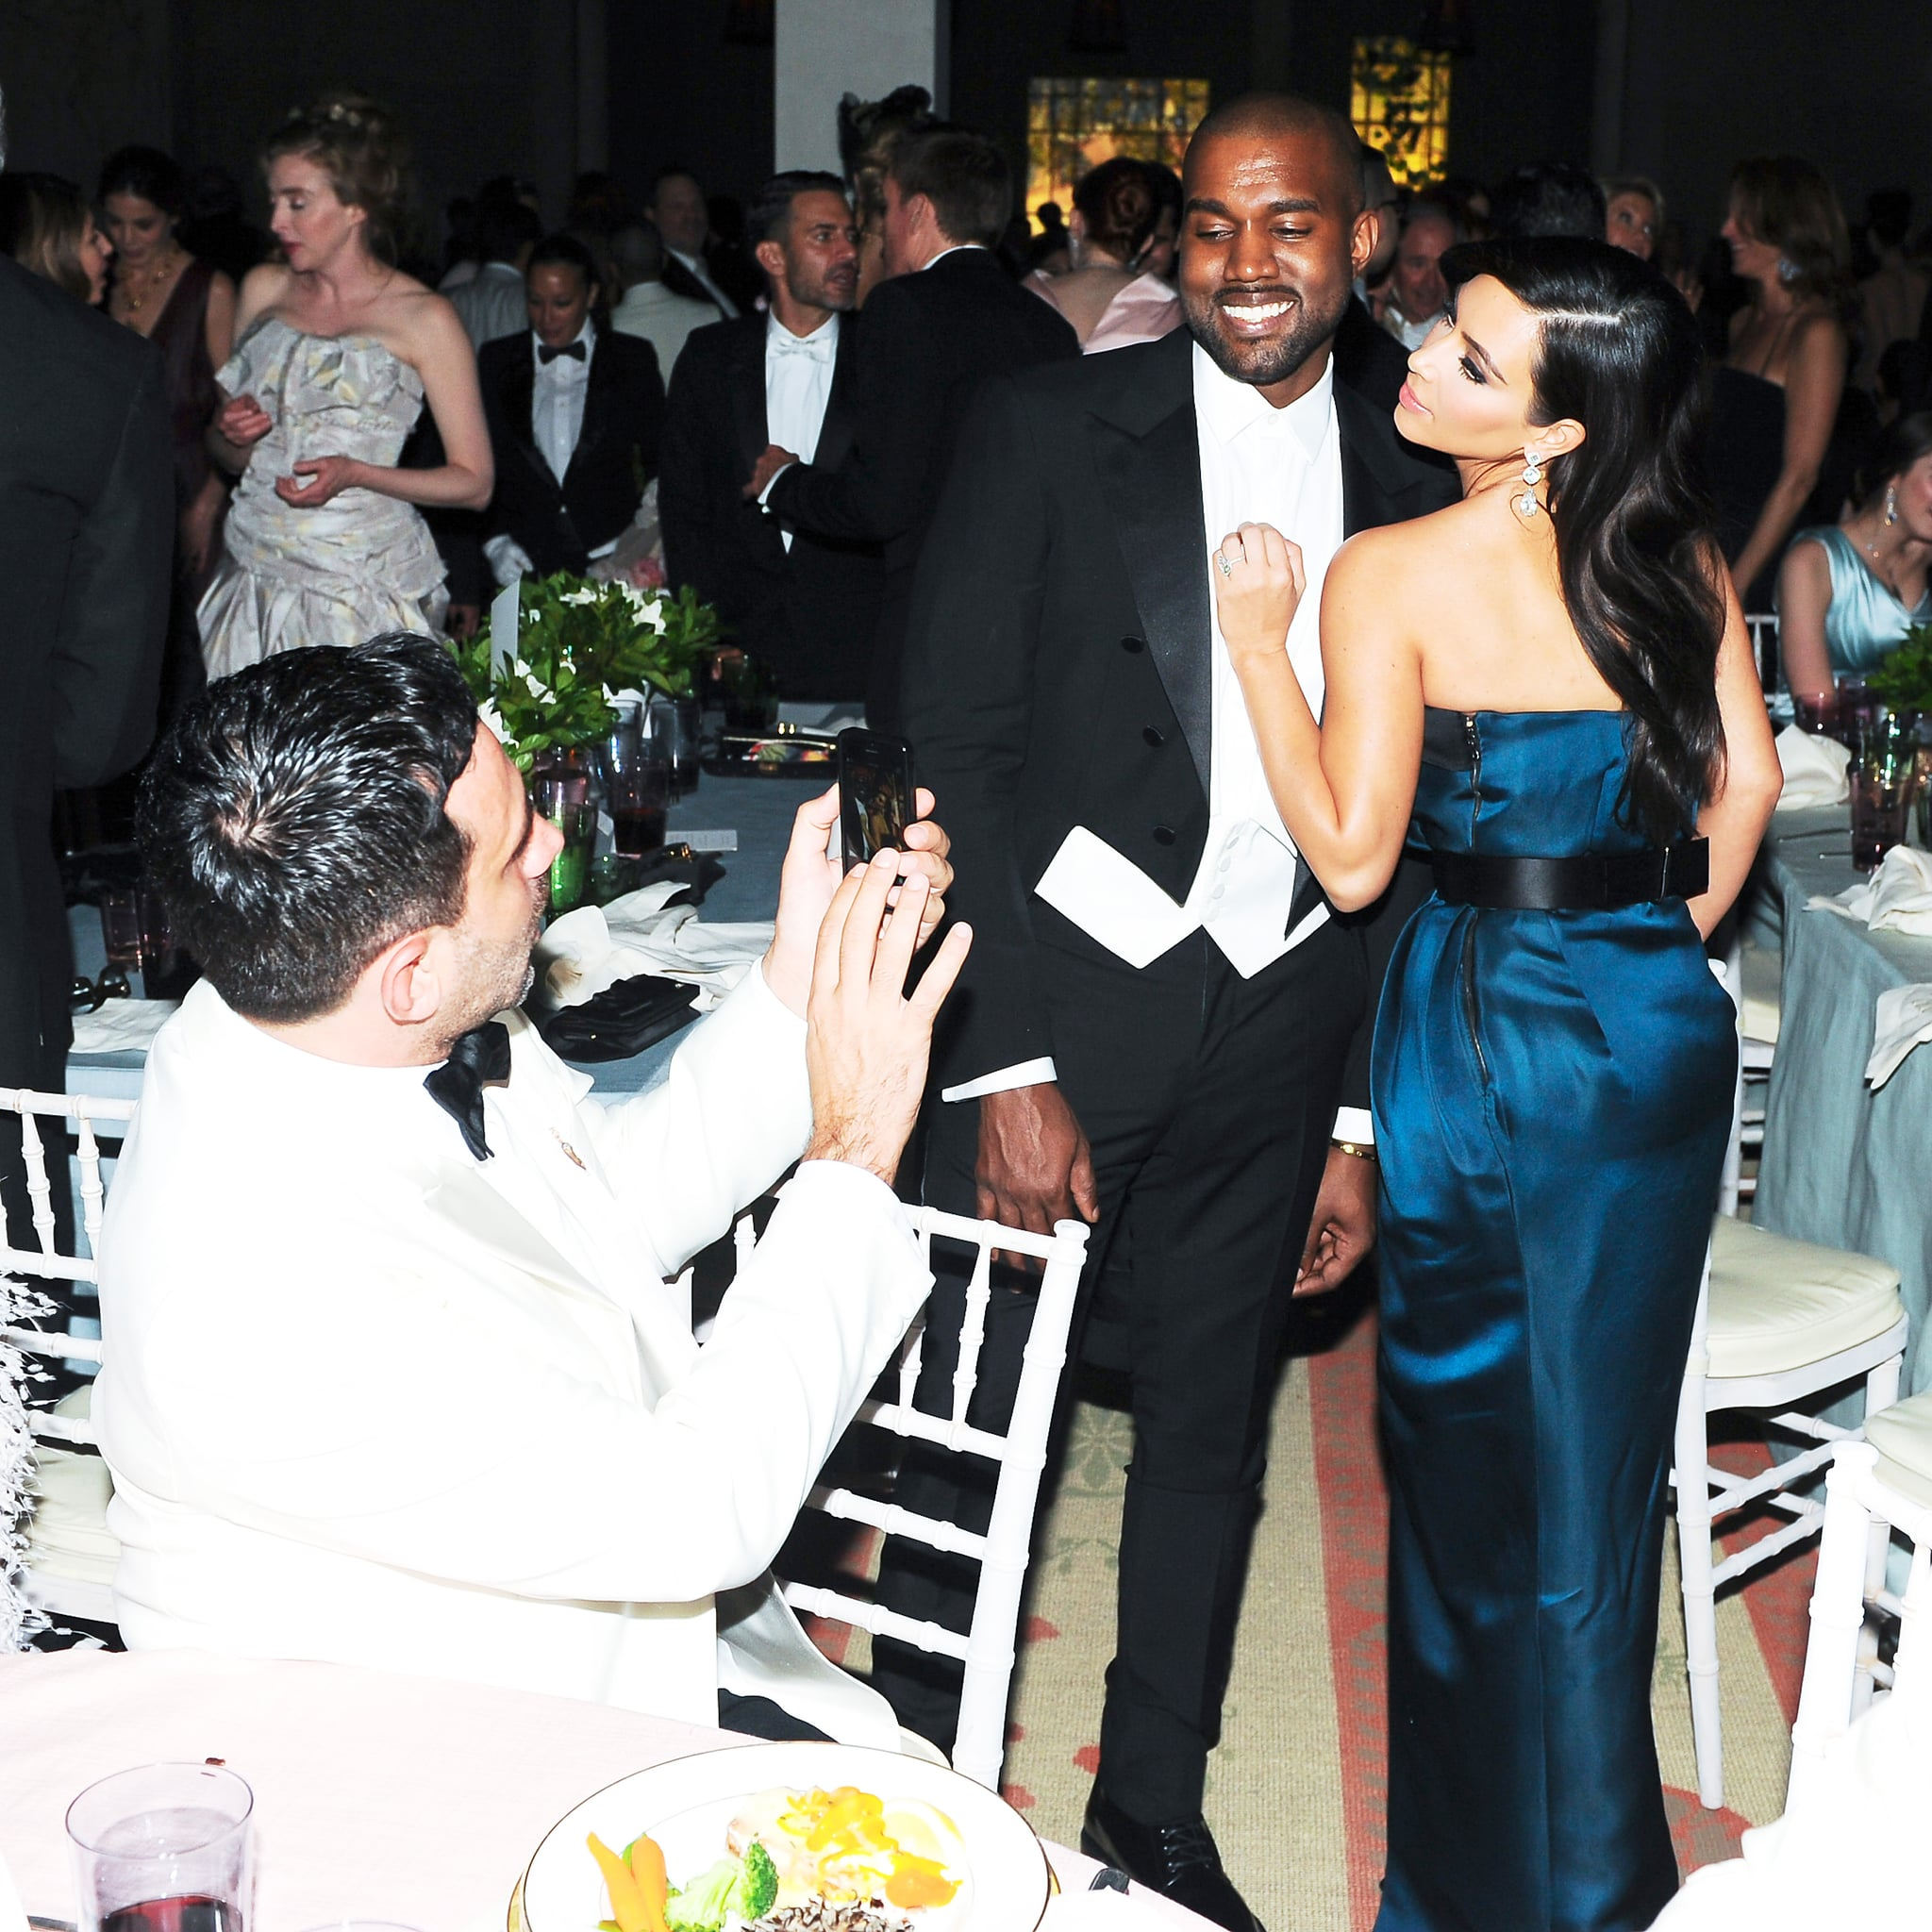 Kim Kardashian struck a pose with Kanye West during dinner.